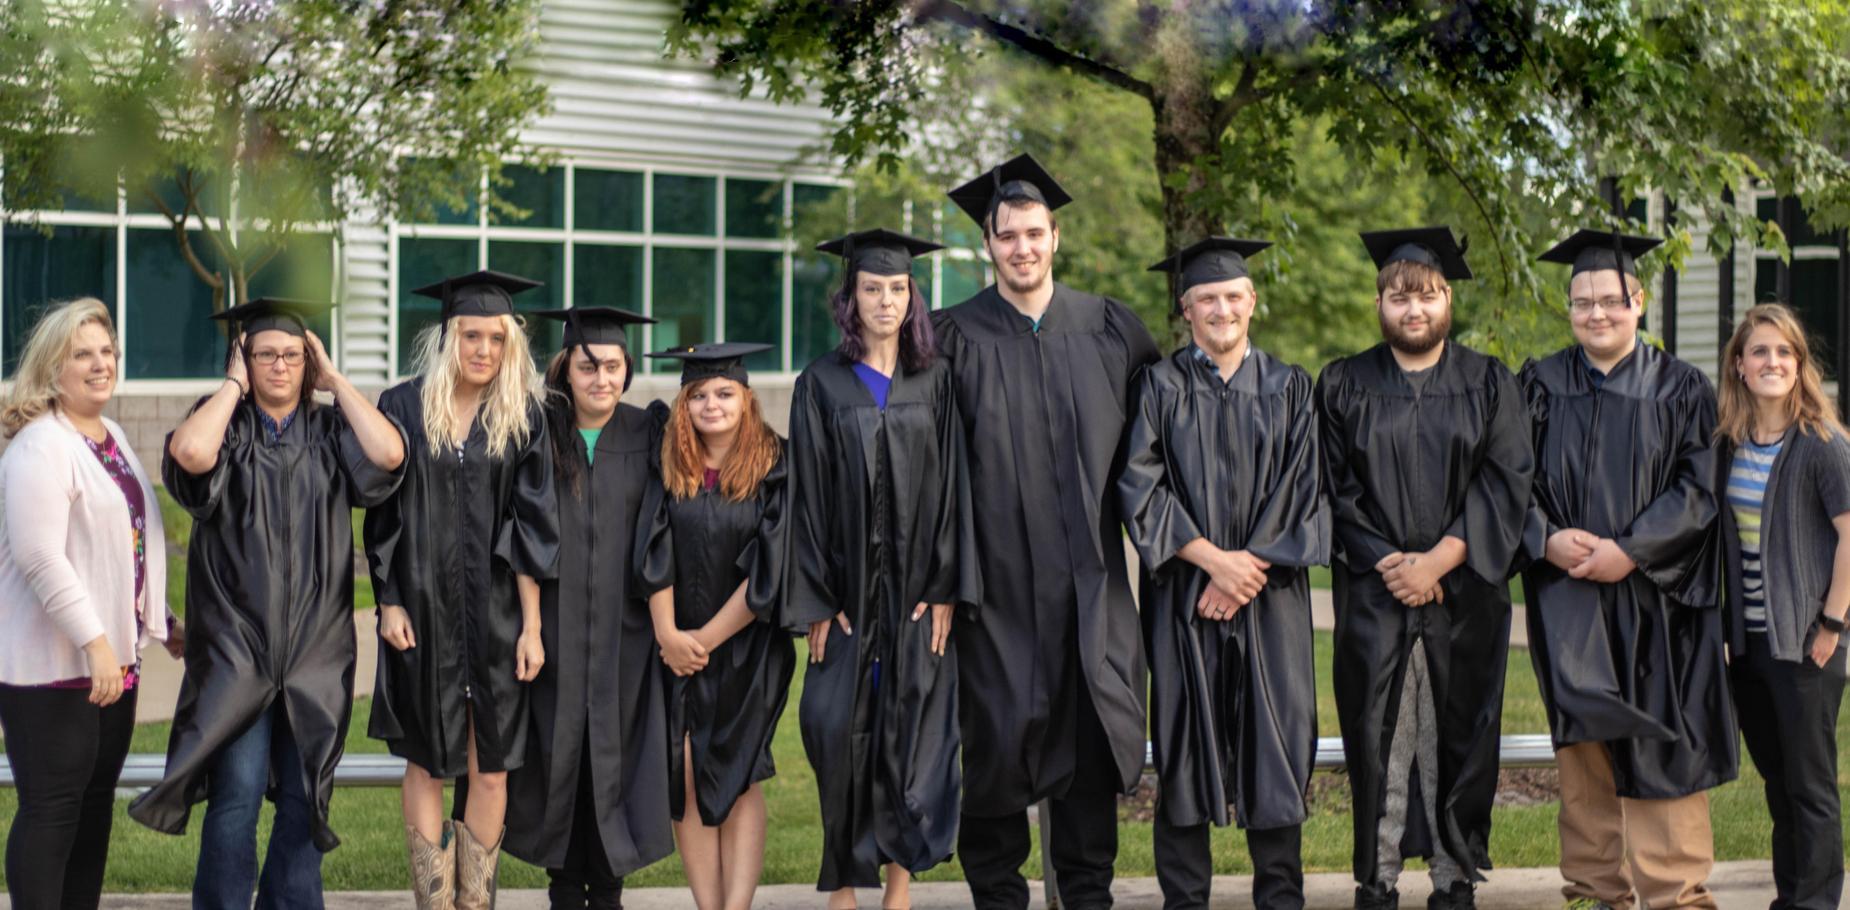 Indiana County HSE Graduates 2018-2019